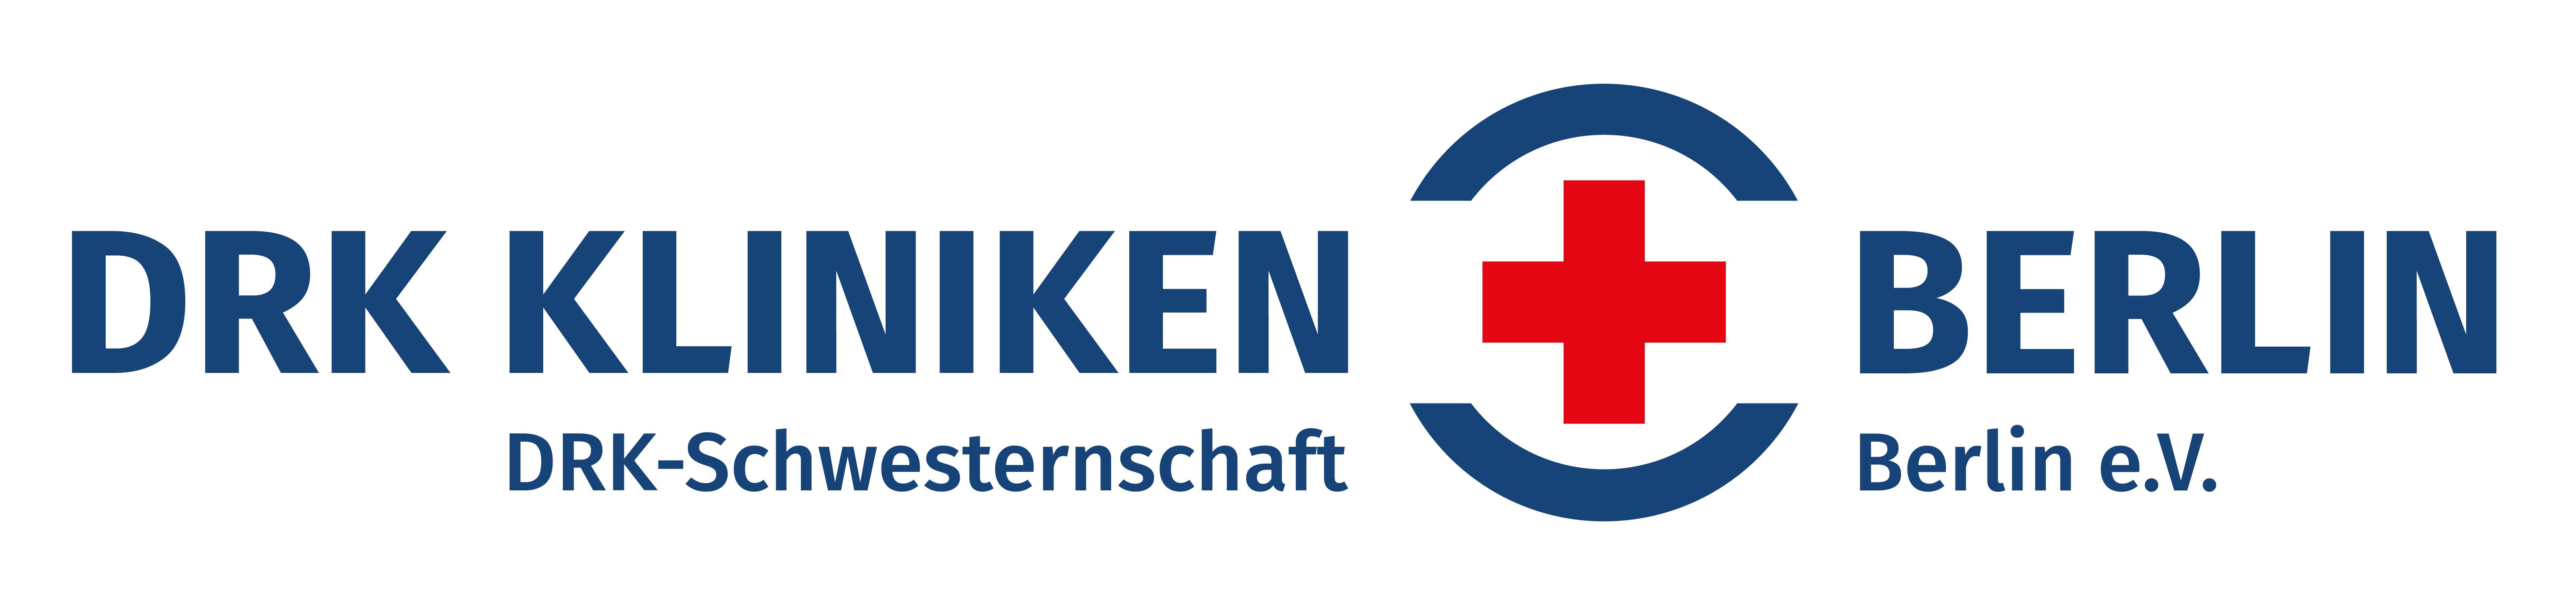 dkb_logo_4c